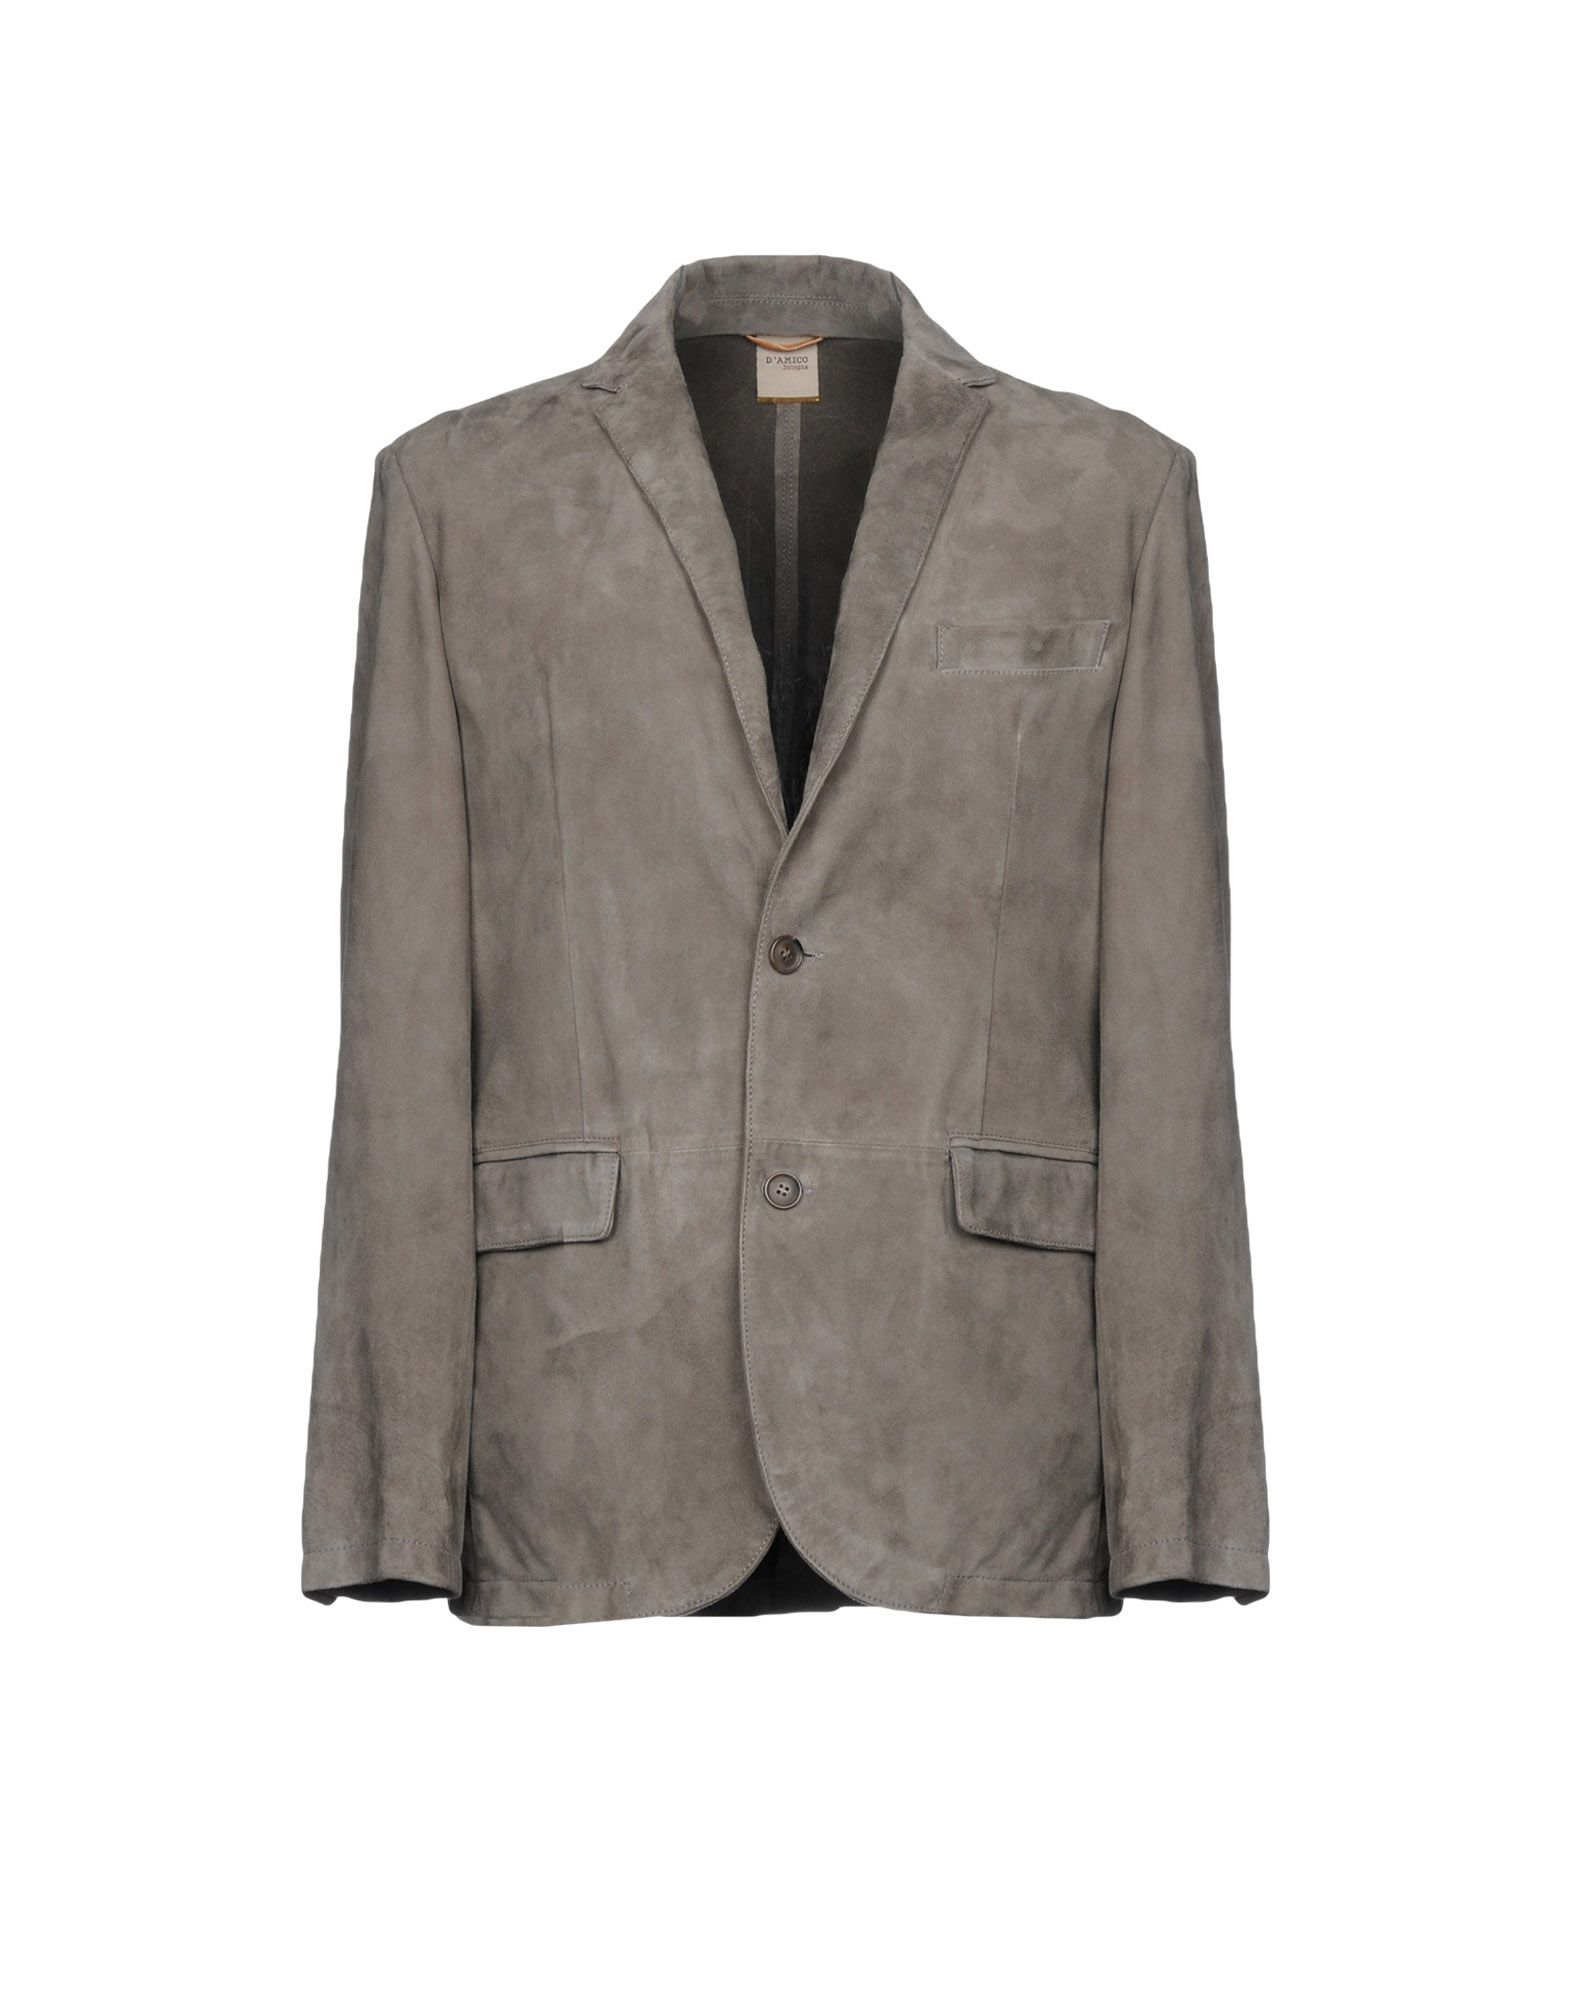 D'AMICO Blazers in Grey